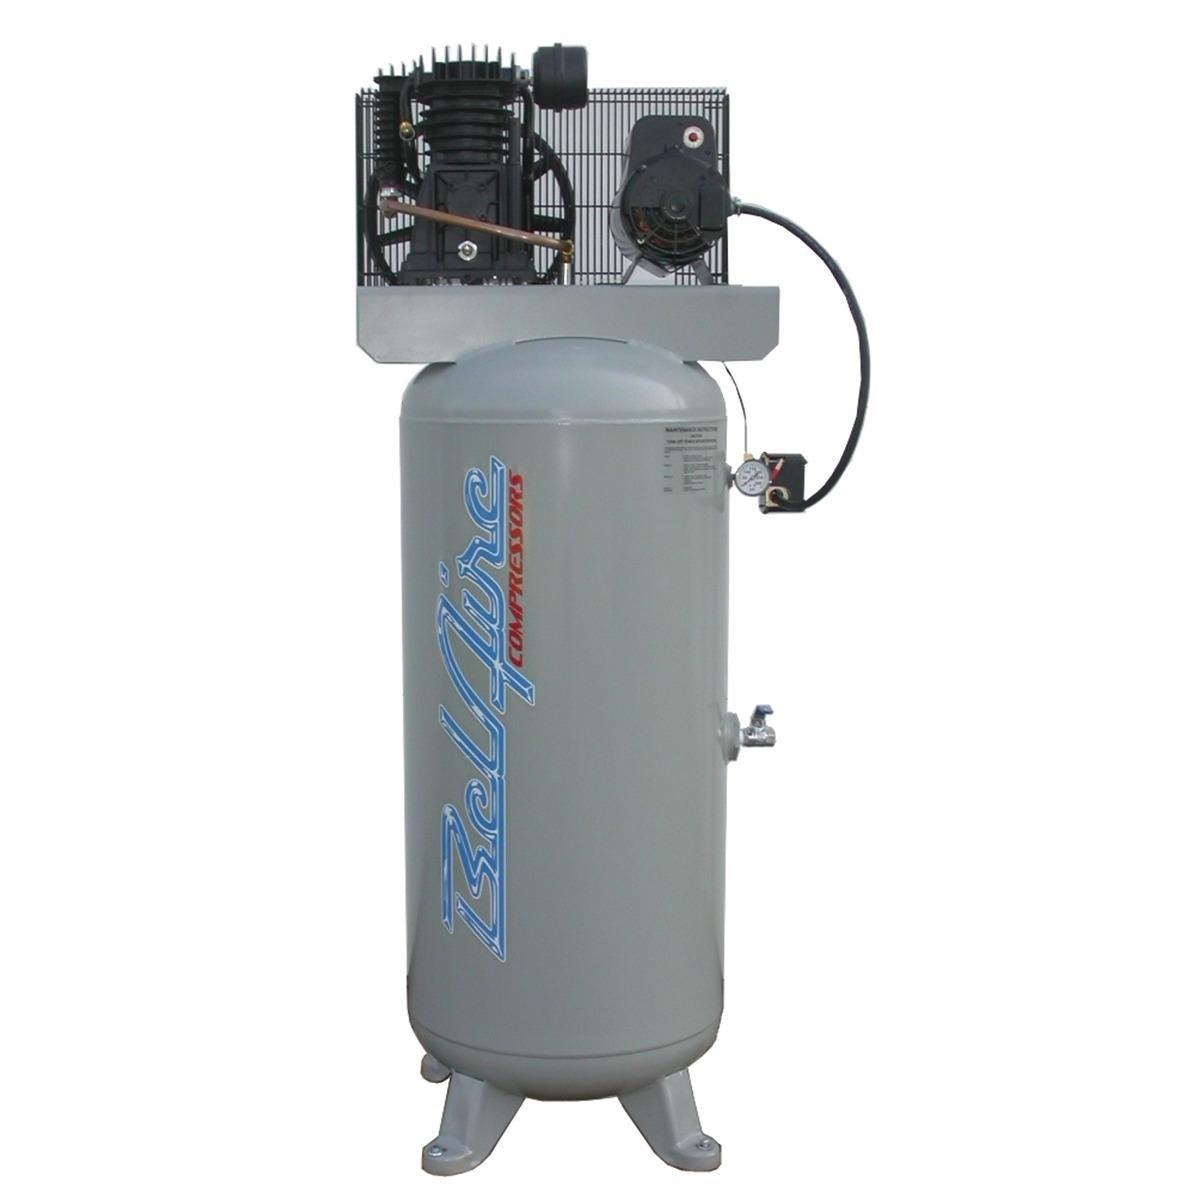 Belair Electric Air Compressor 5hp 60g Vertical 2 Stage